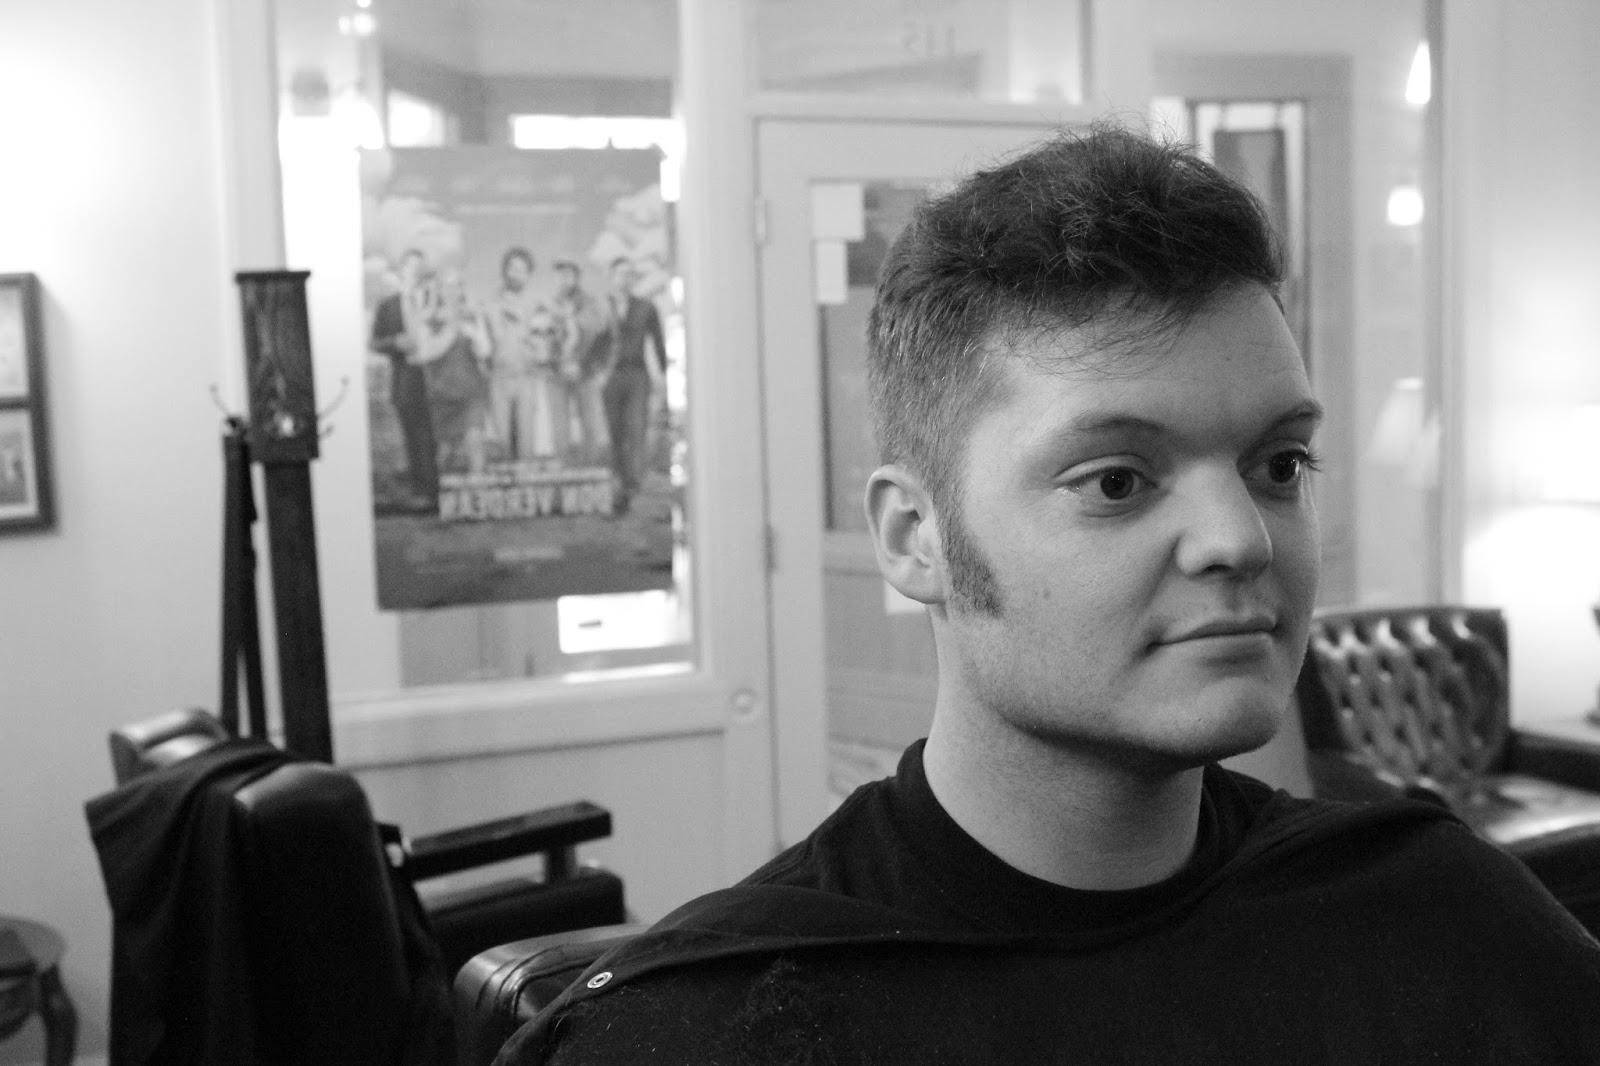 Danburry Barber Shop: Griffin Taylor